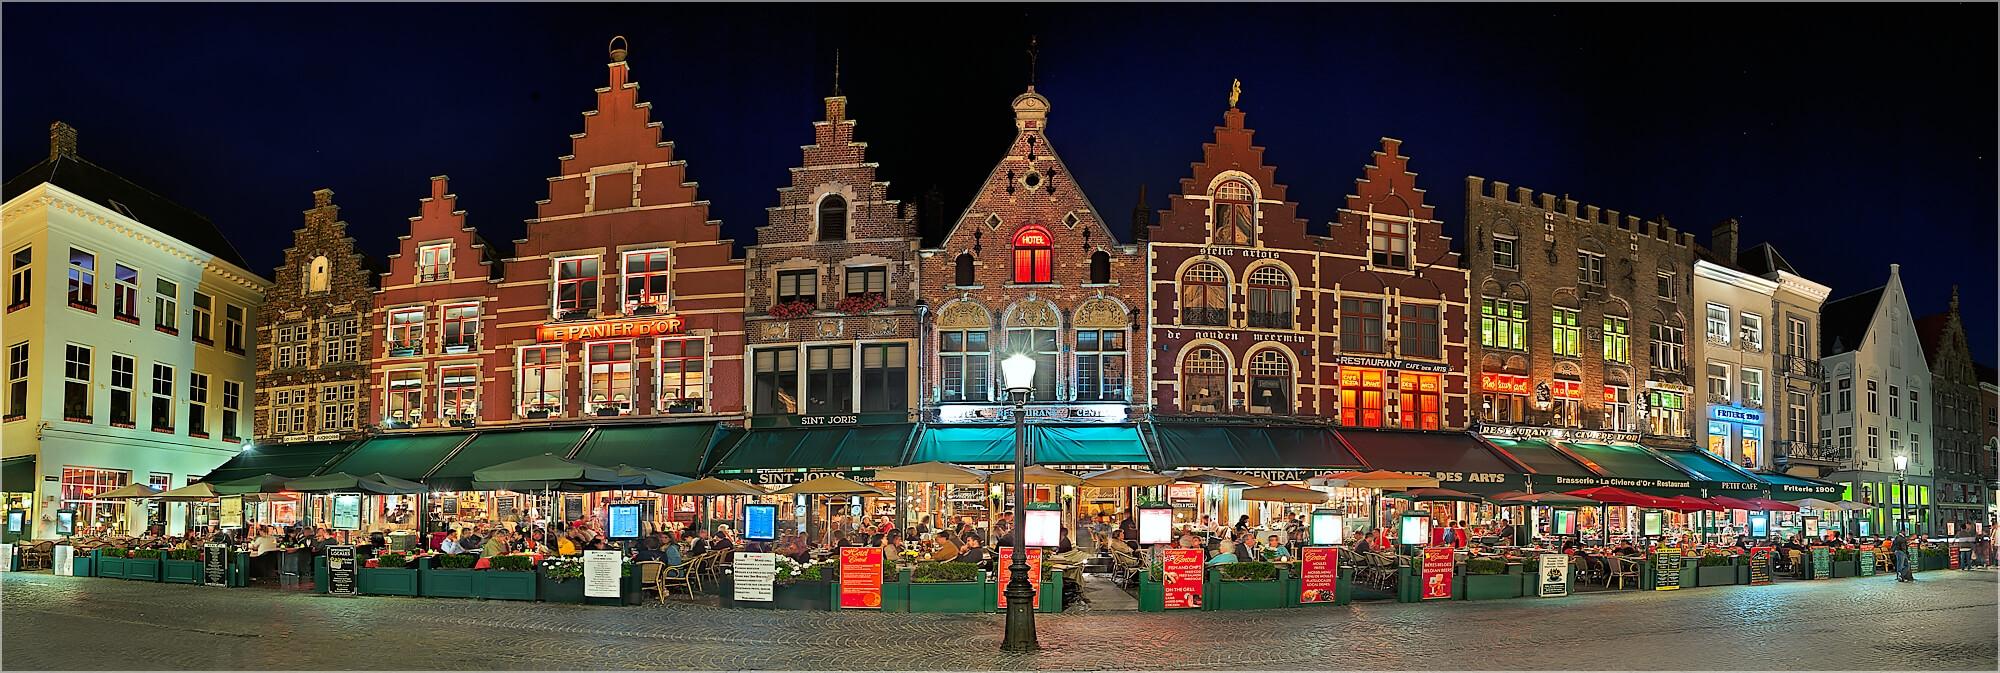 Panoramabild Häuserzeile Gent Belgien